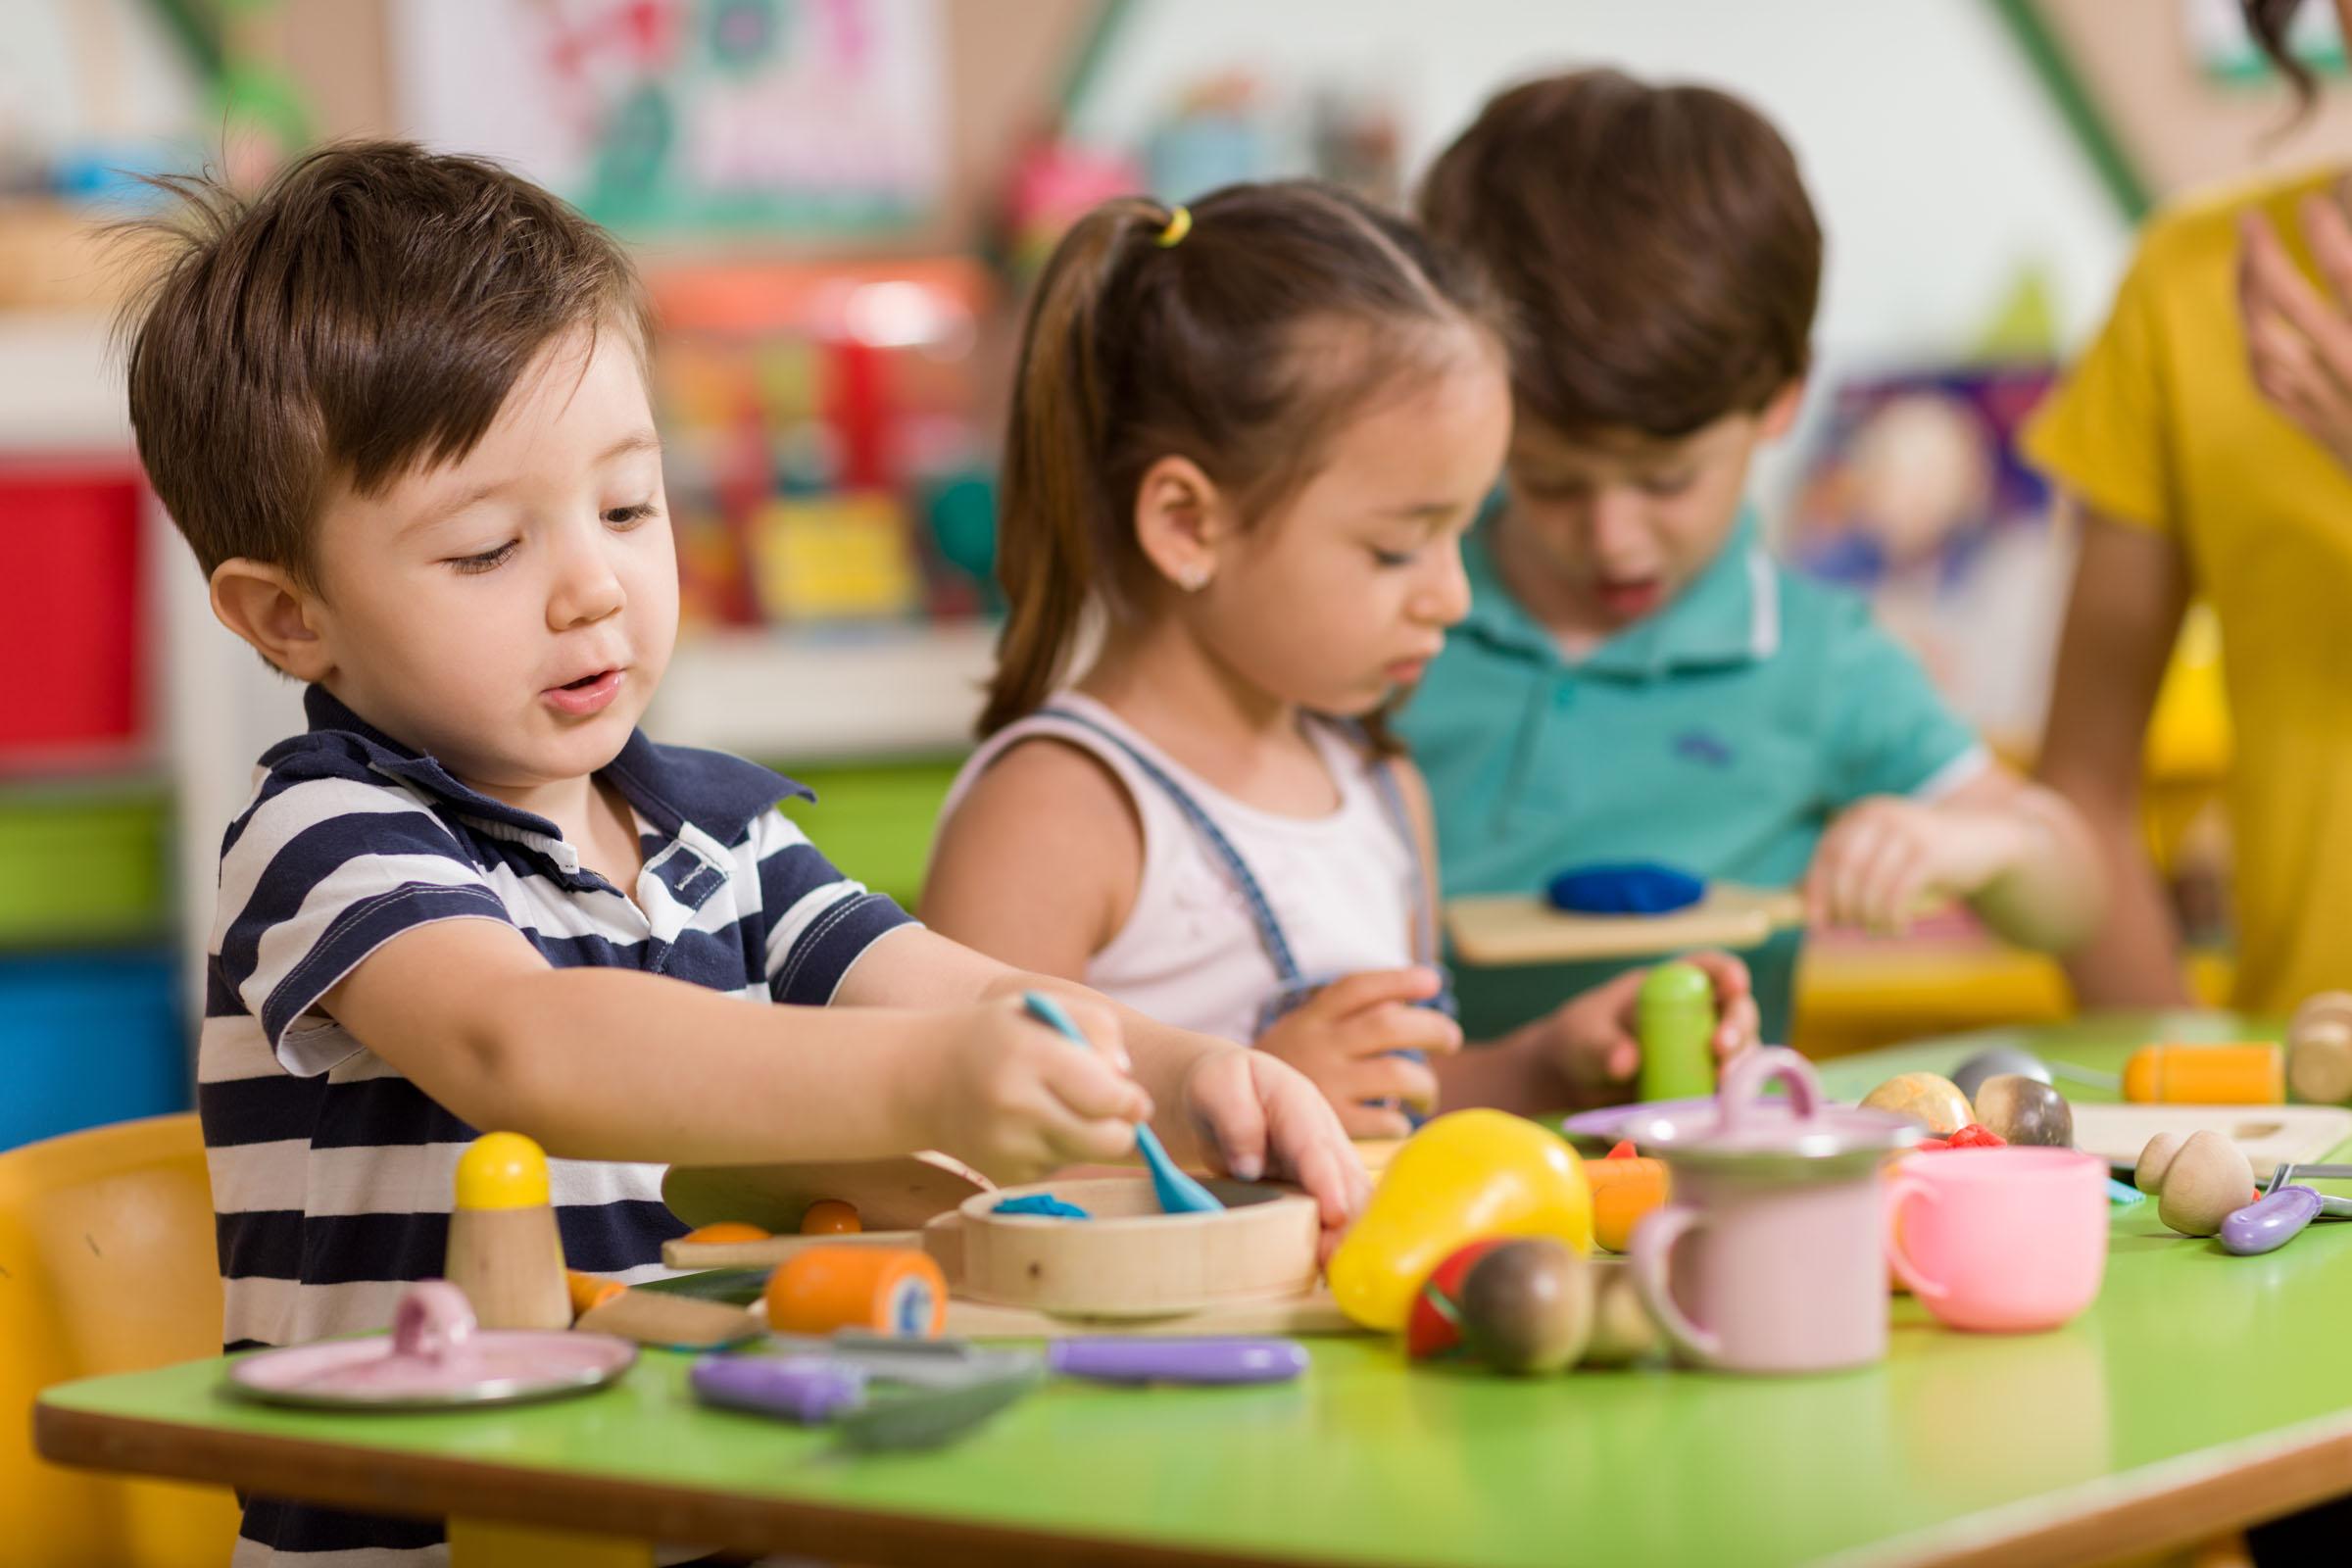 Preschool Pals children playing house